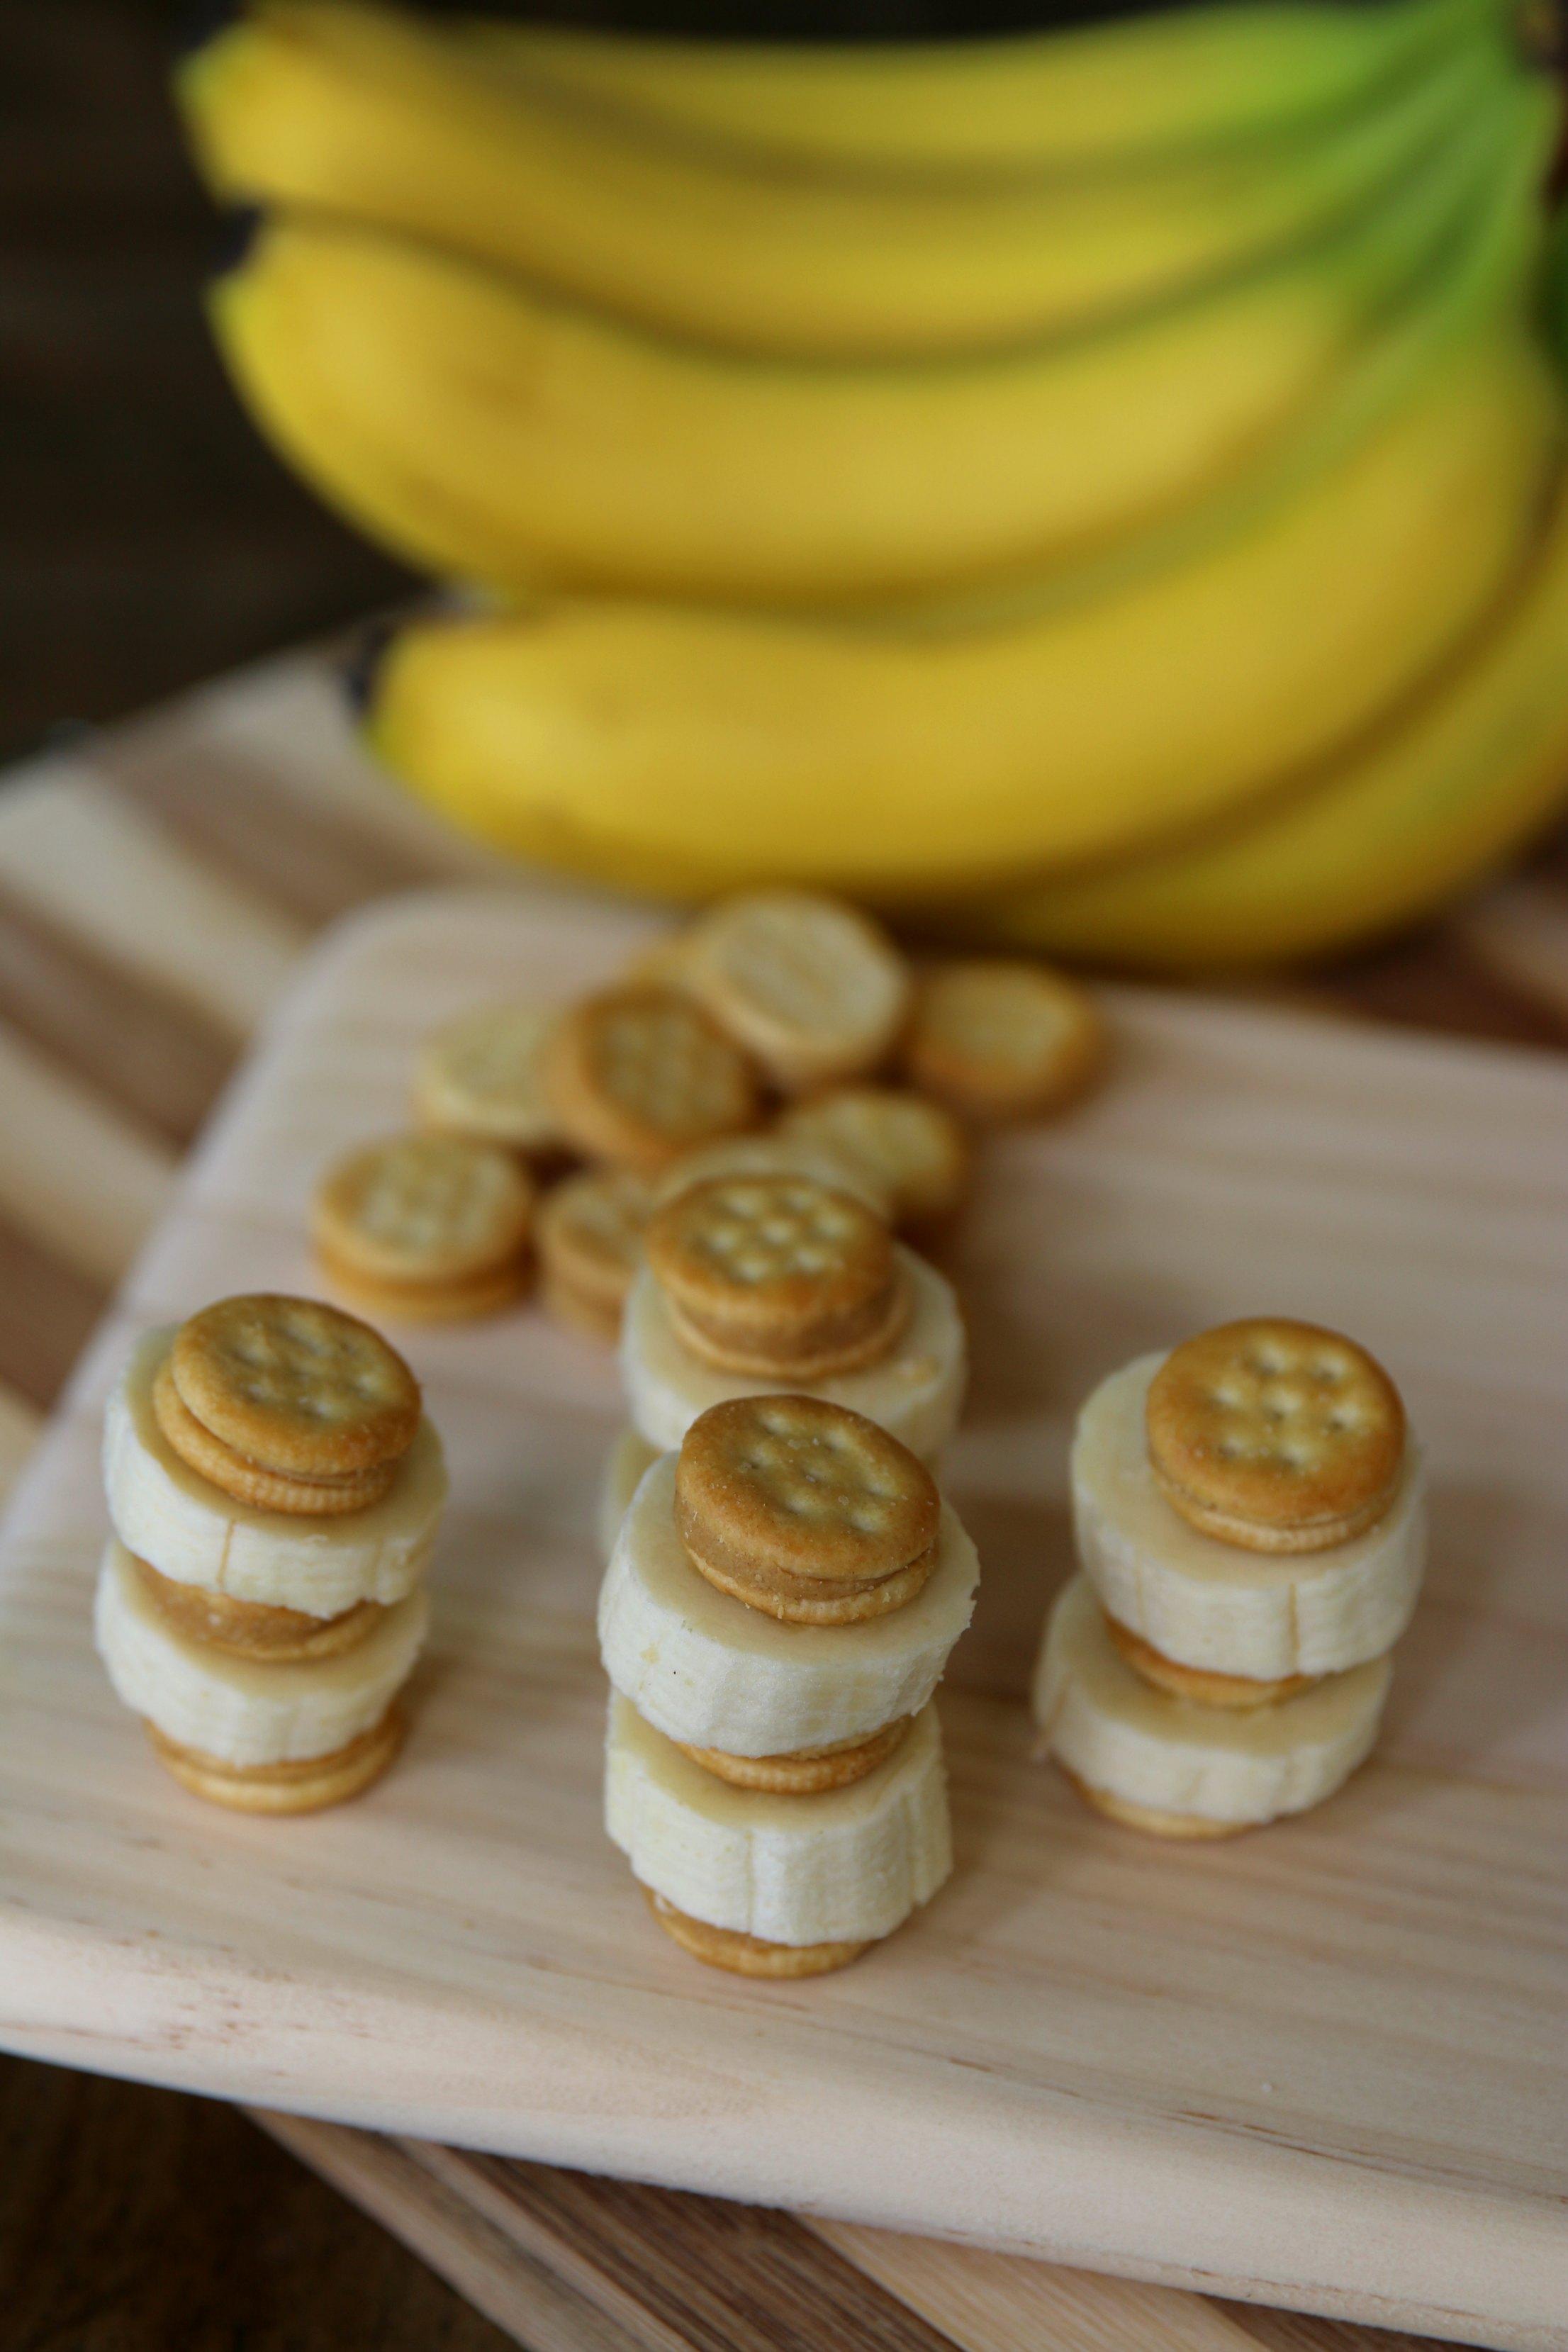 peanut butter banana crackers